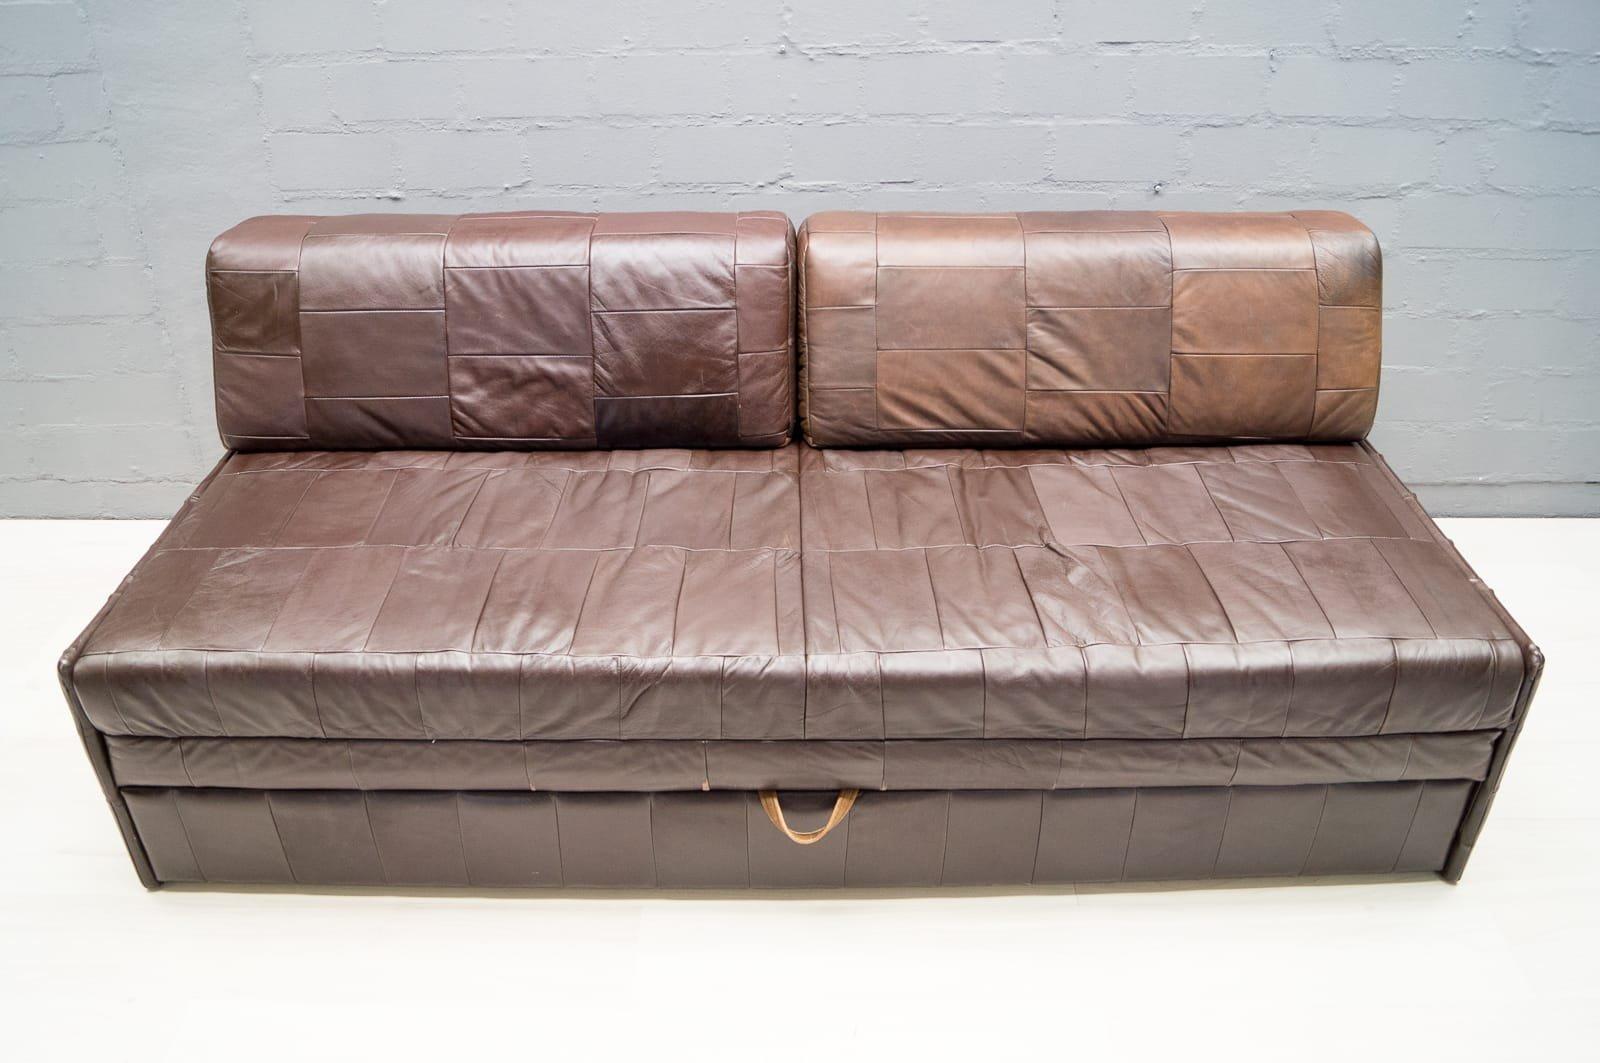 vintage patchwork leather sofa 1960s for sale at pamono. Black Bedroom Furniture Sets. Home Design Ideas